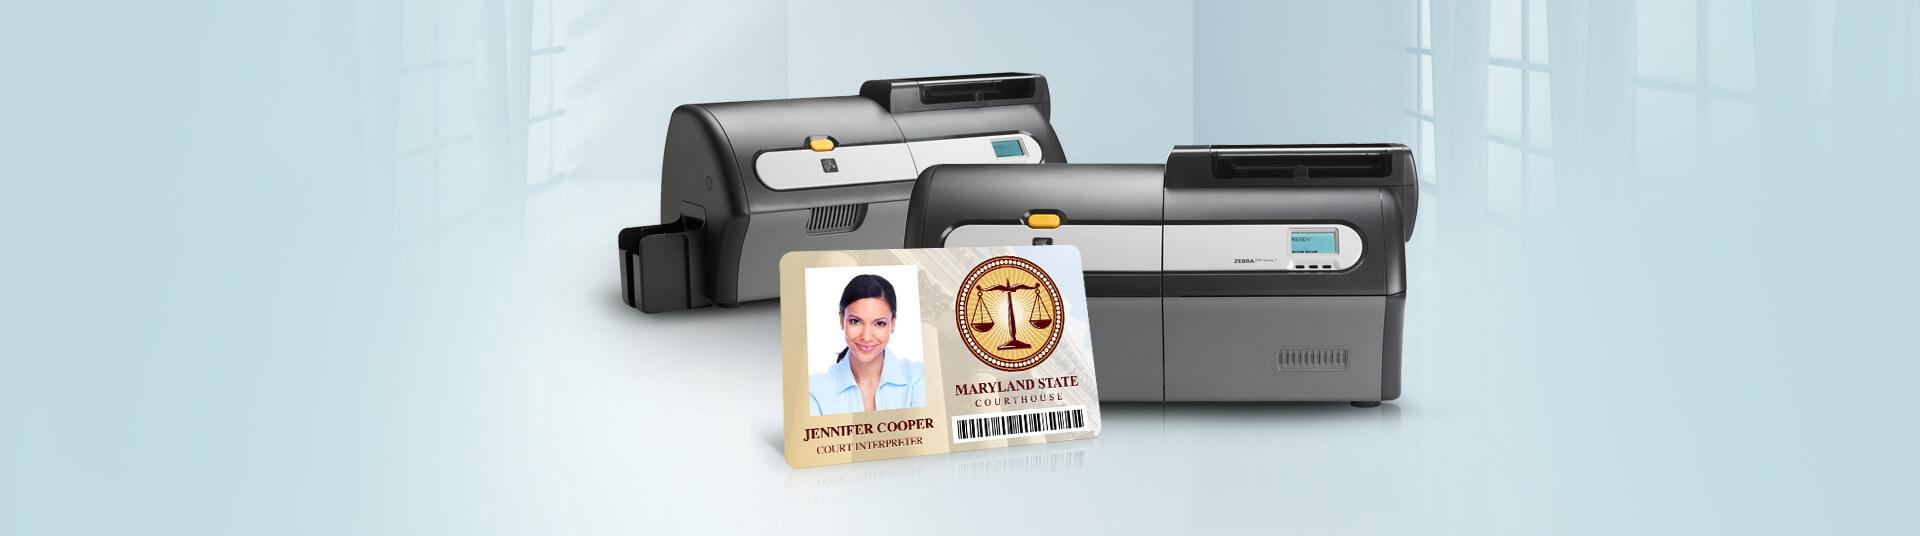 Zebra ZXP Series 7 ID Card Printers